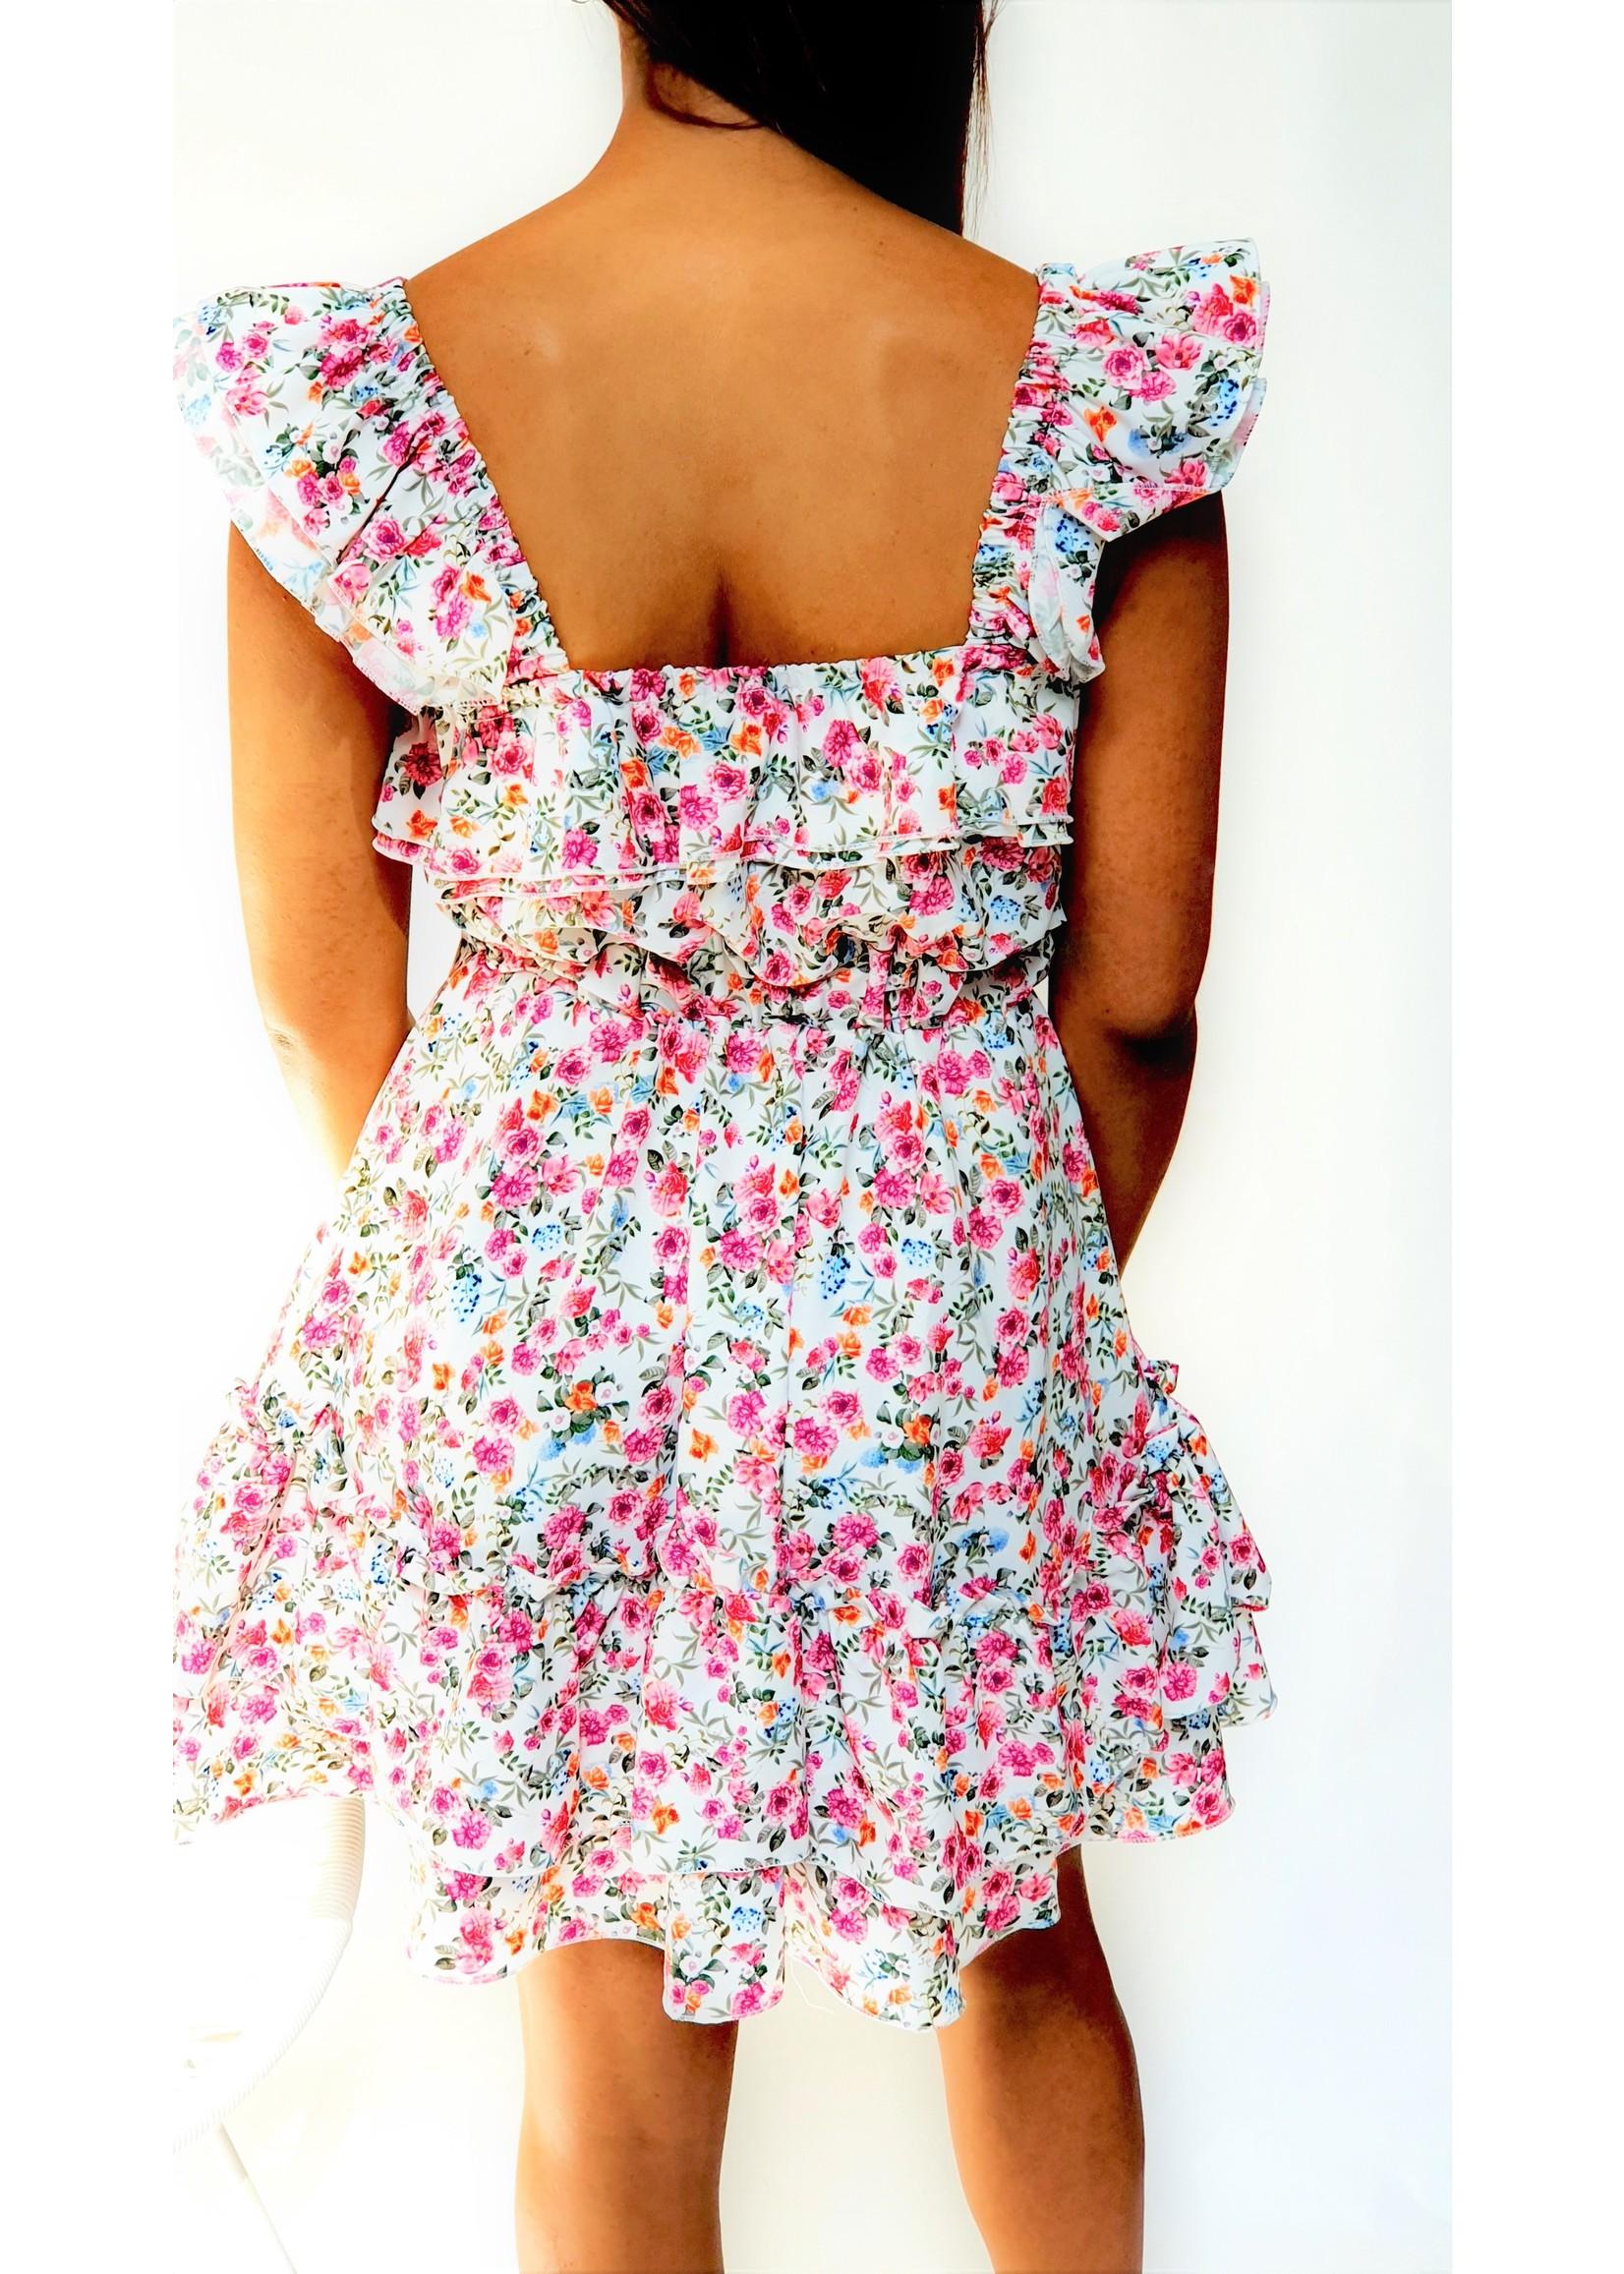 Señorita dress